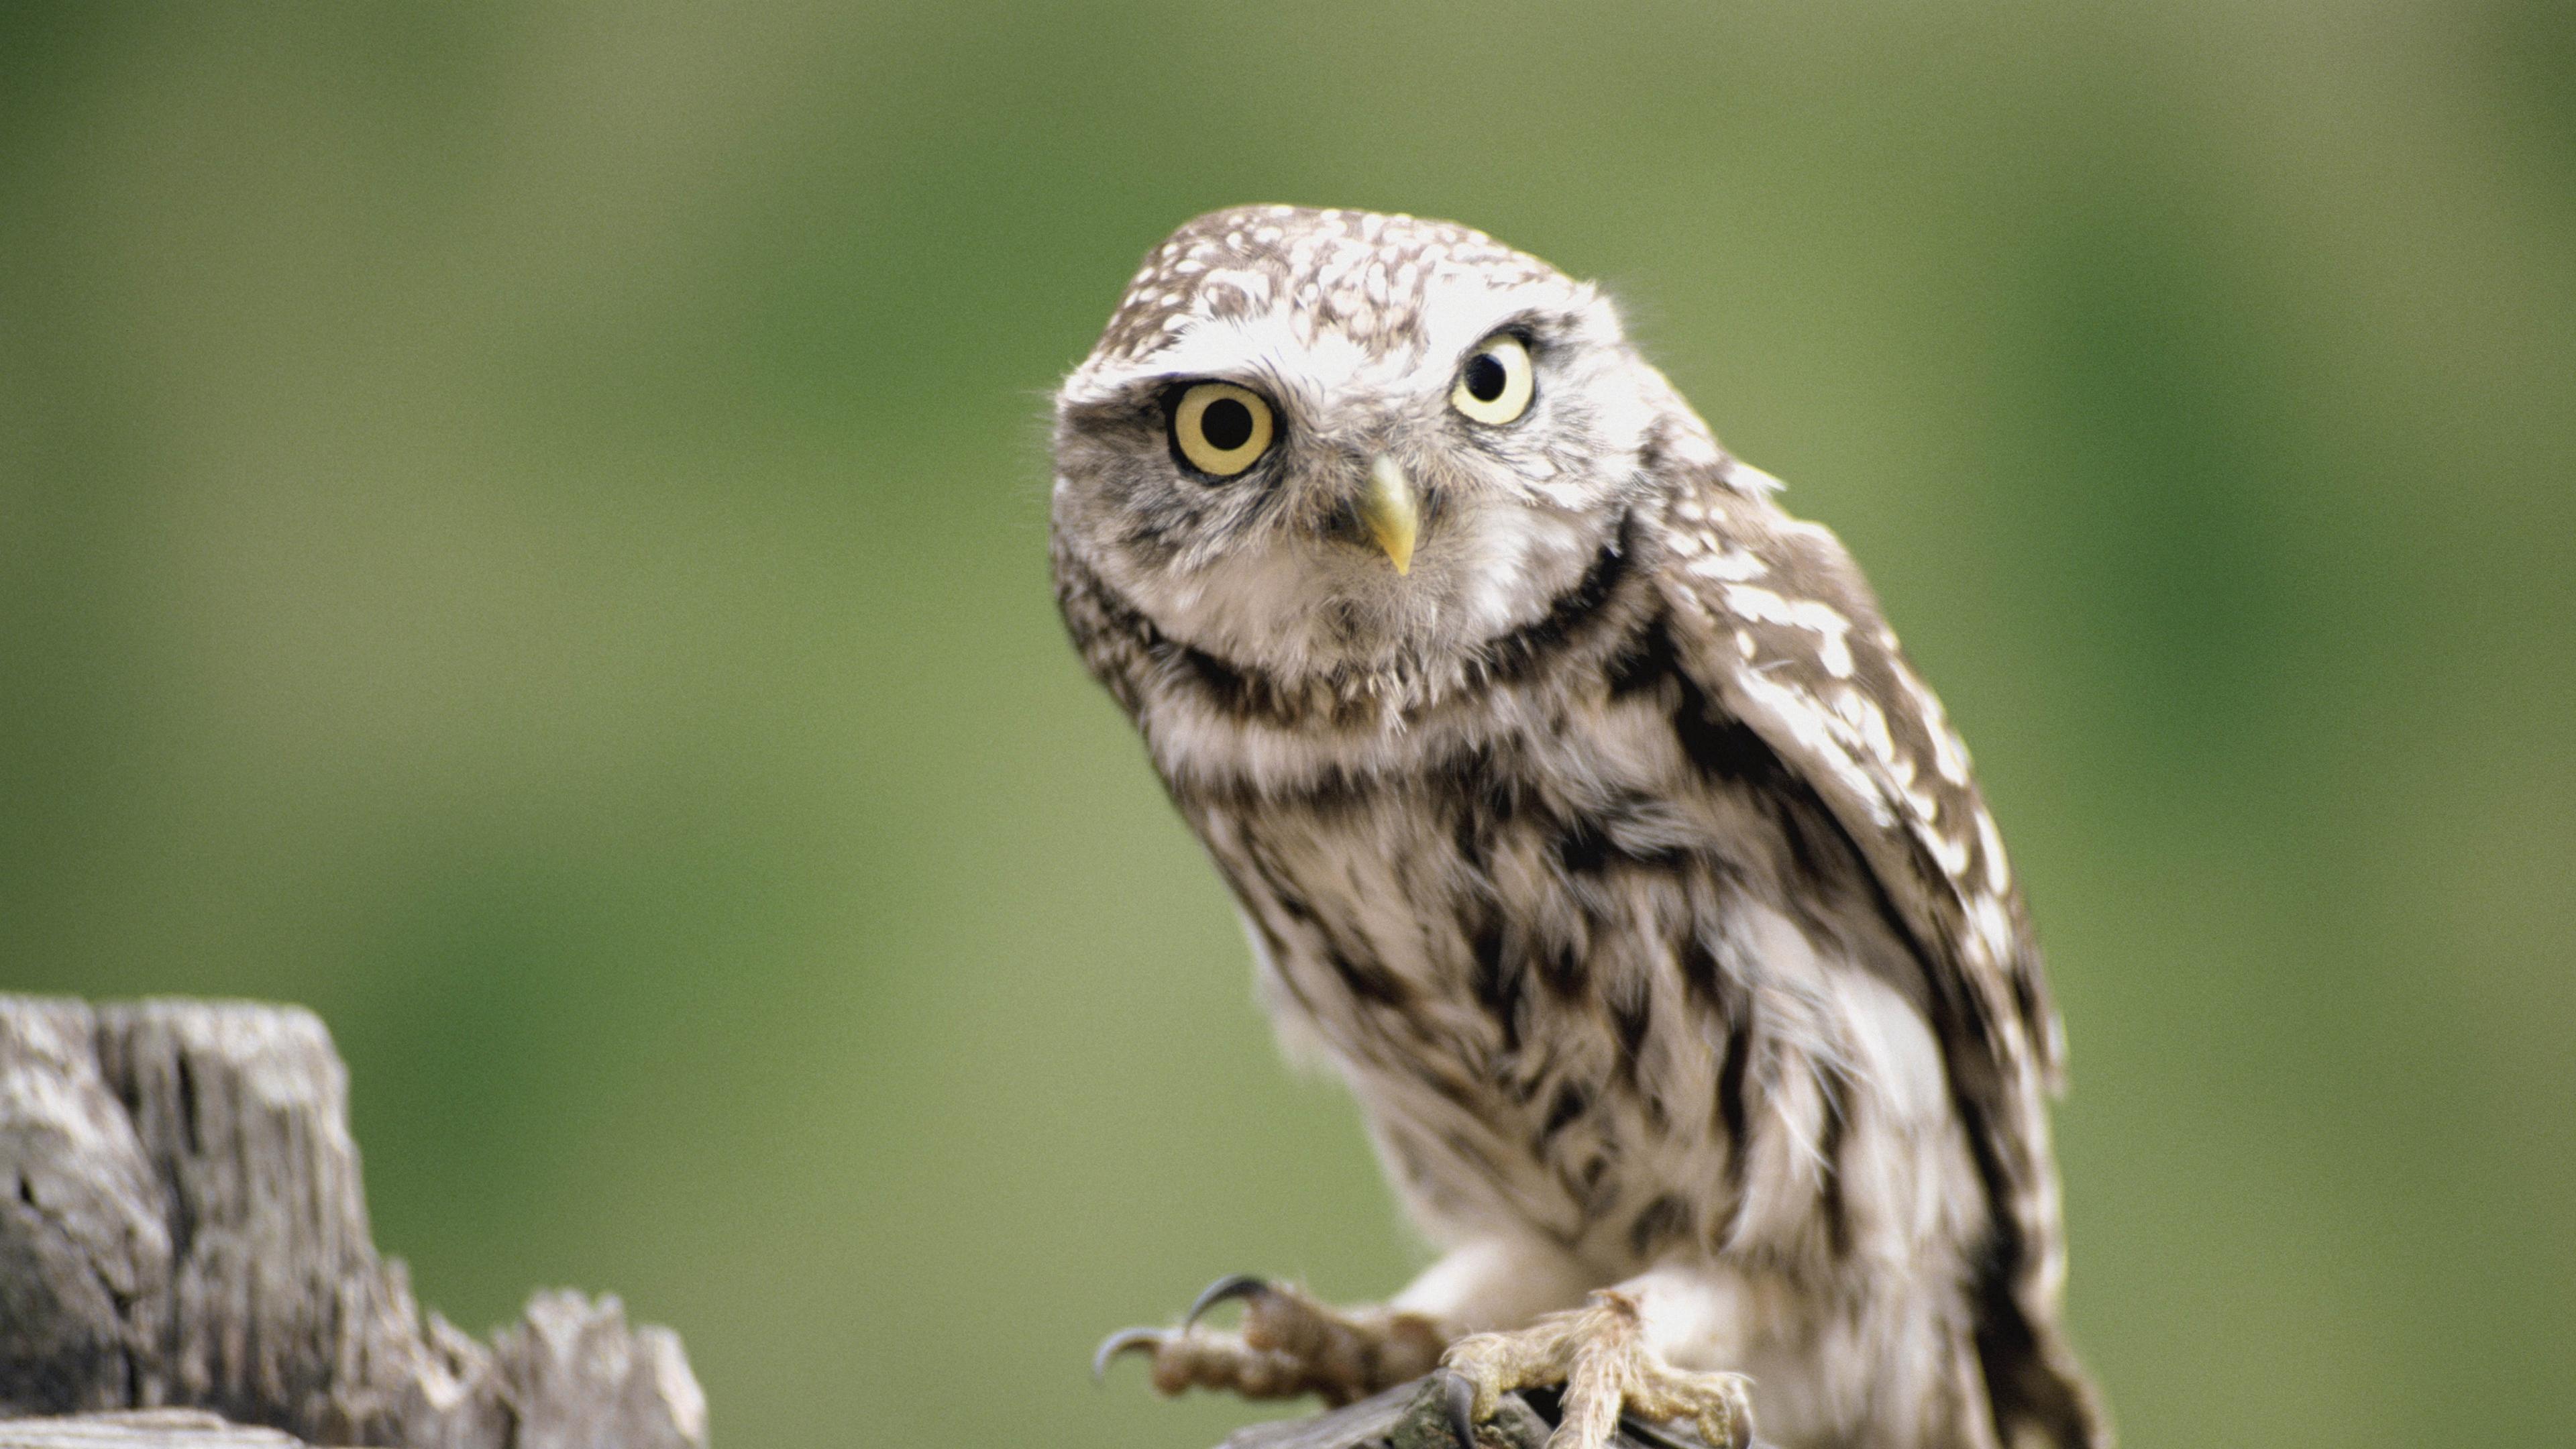 owl branch bird predator 4k 1542241594 - owl, branch, bird, predator 4k - Owl, branch, Bird